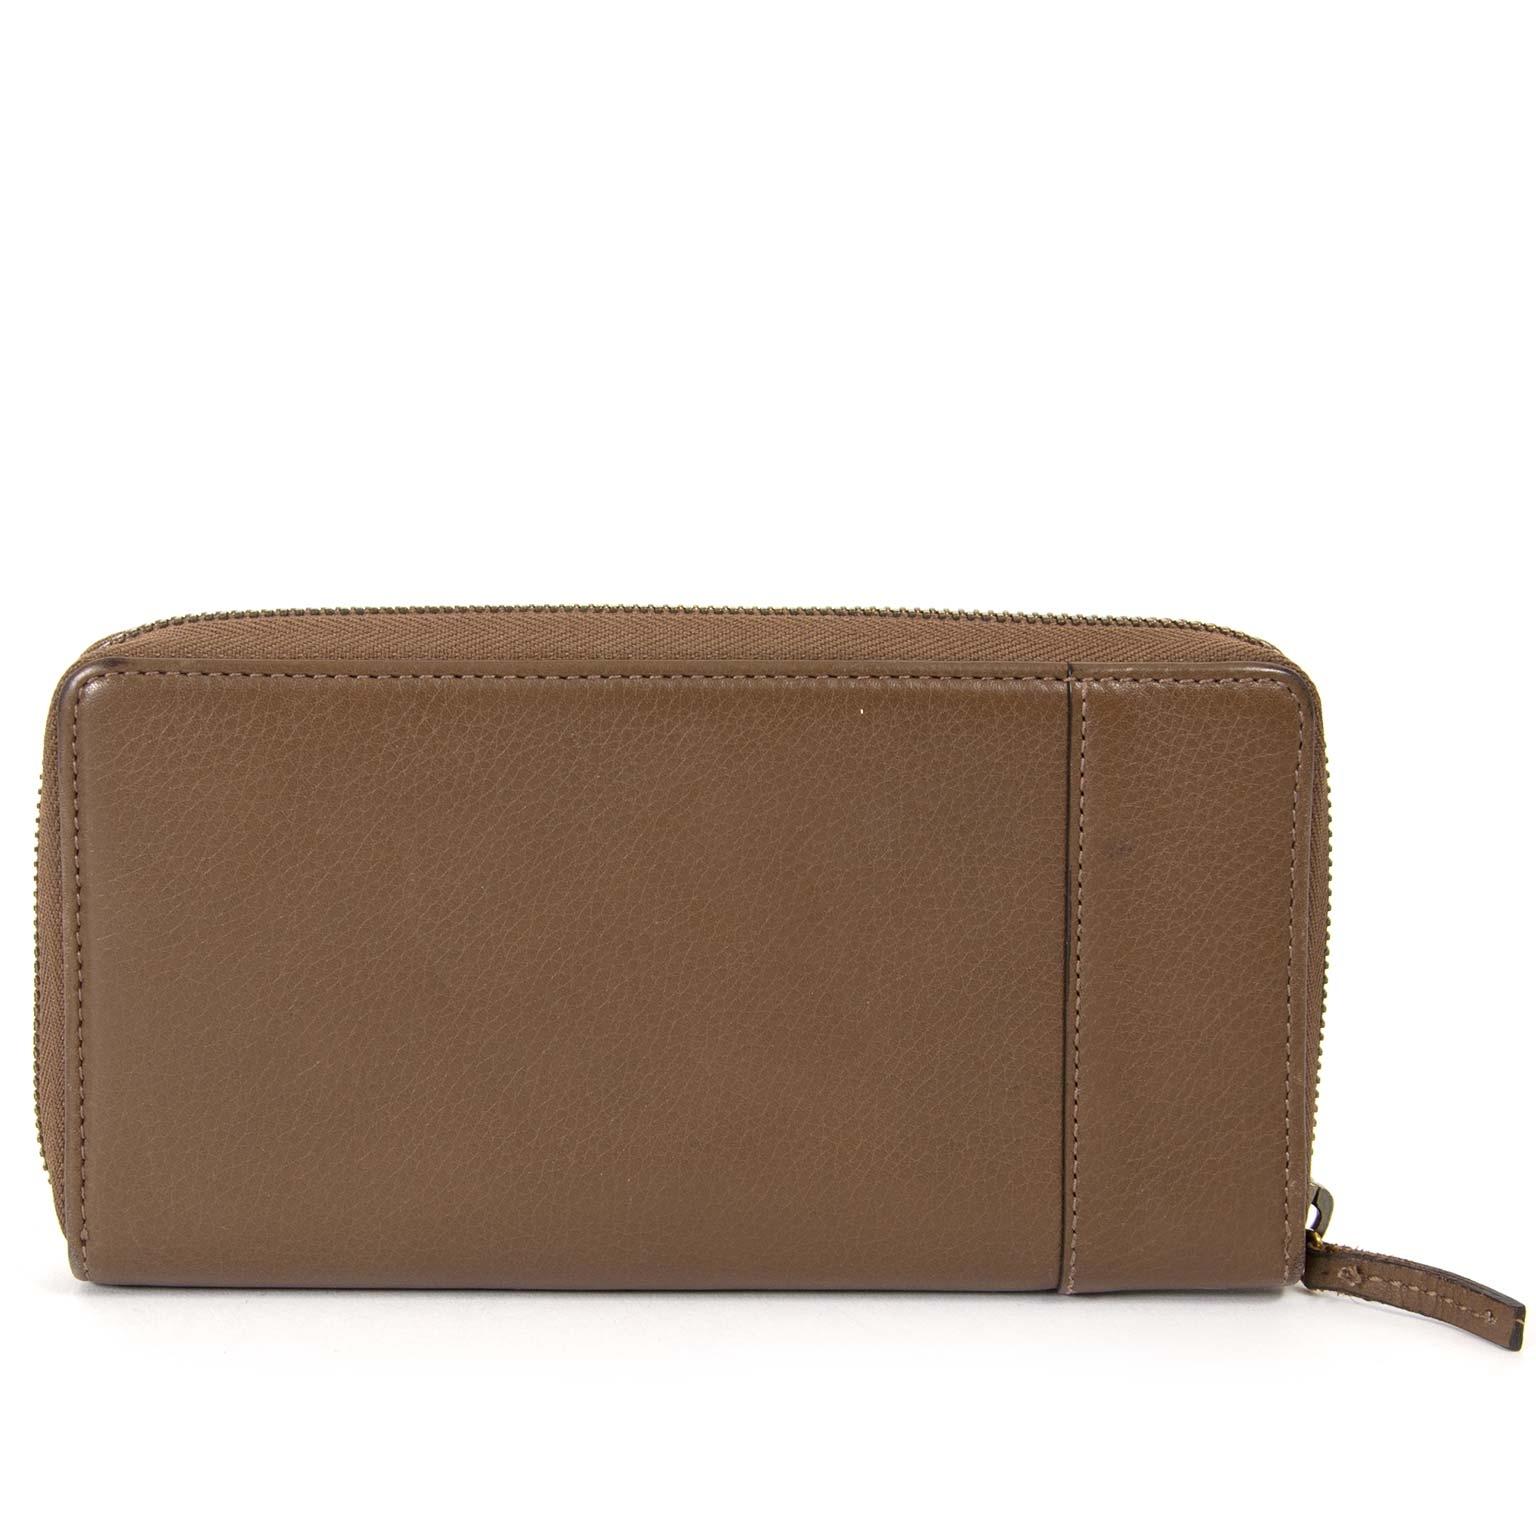 6e4922a6133 ... te koop bij labellov vintage mode webshop belgië gucci brown  interlocking g wallet now for sale at labellov vintage fashion webshop  belgium